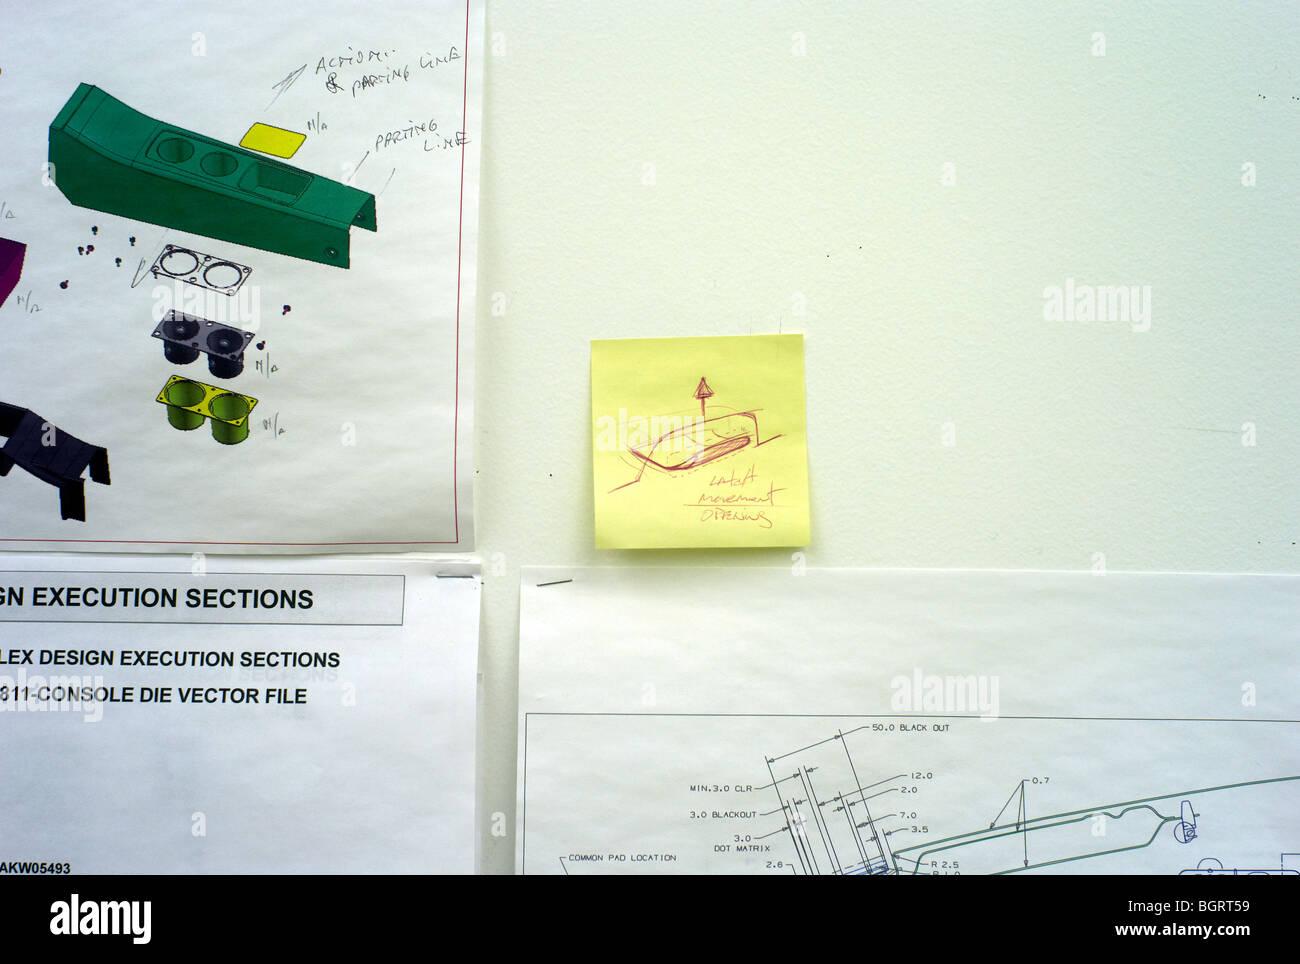 hight resolution of handwritten note on wall inside the gm tech center chevy volt lab warren mi 2009